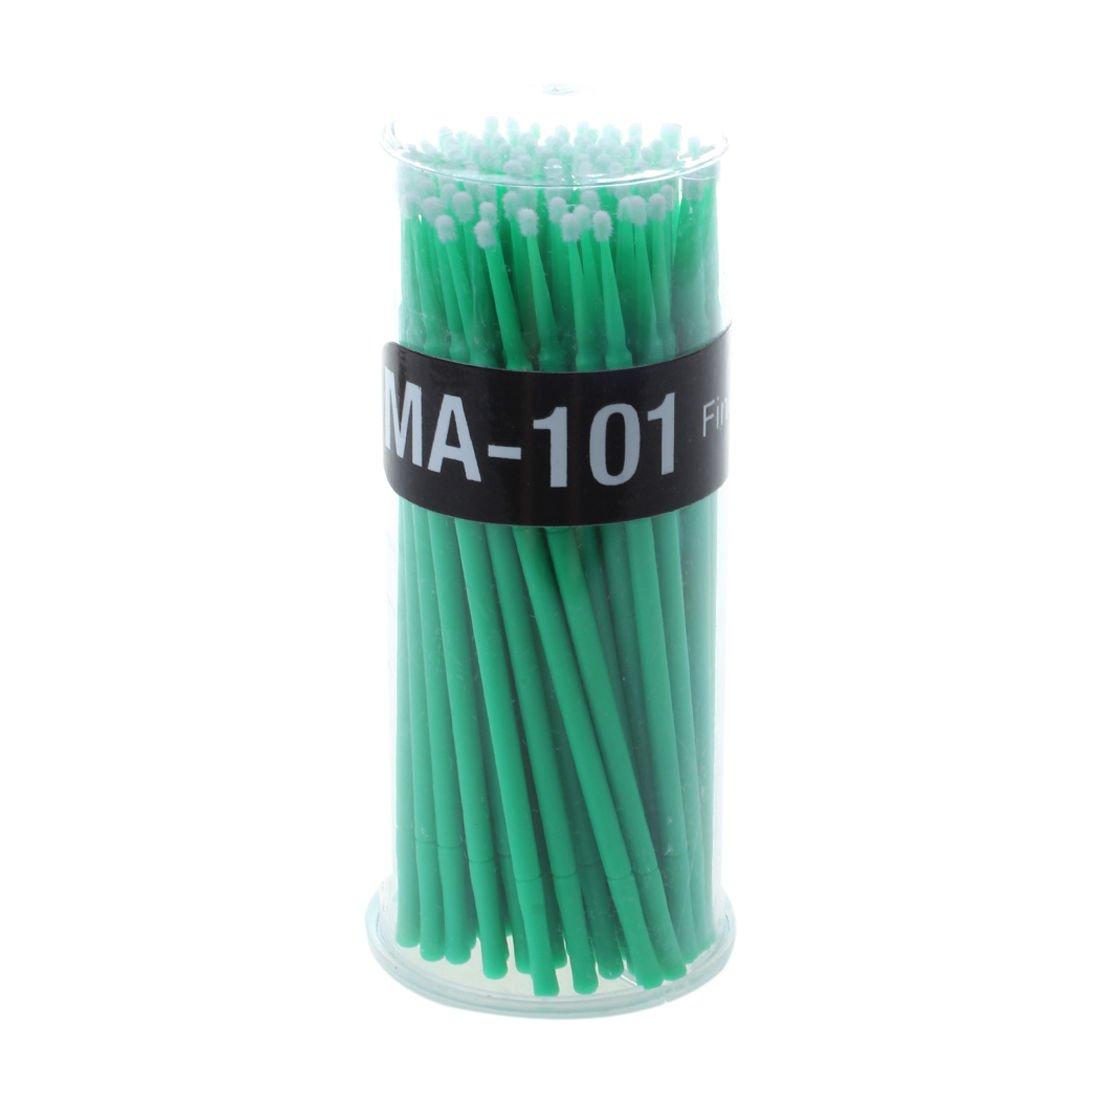 Eyelash Extension Micro Brushes - SODIAL(R)100pcs Eyelash Extension Micro Brushes Disposable Individual Mascara Pro Makeup green